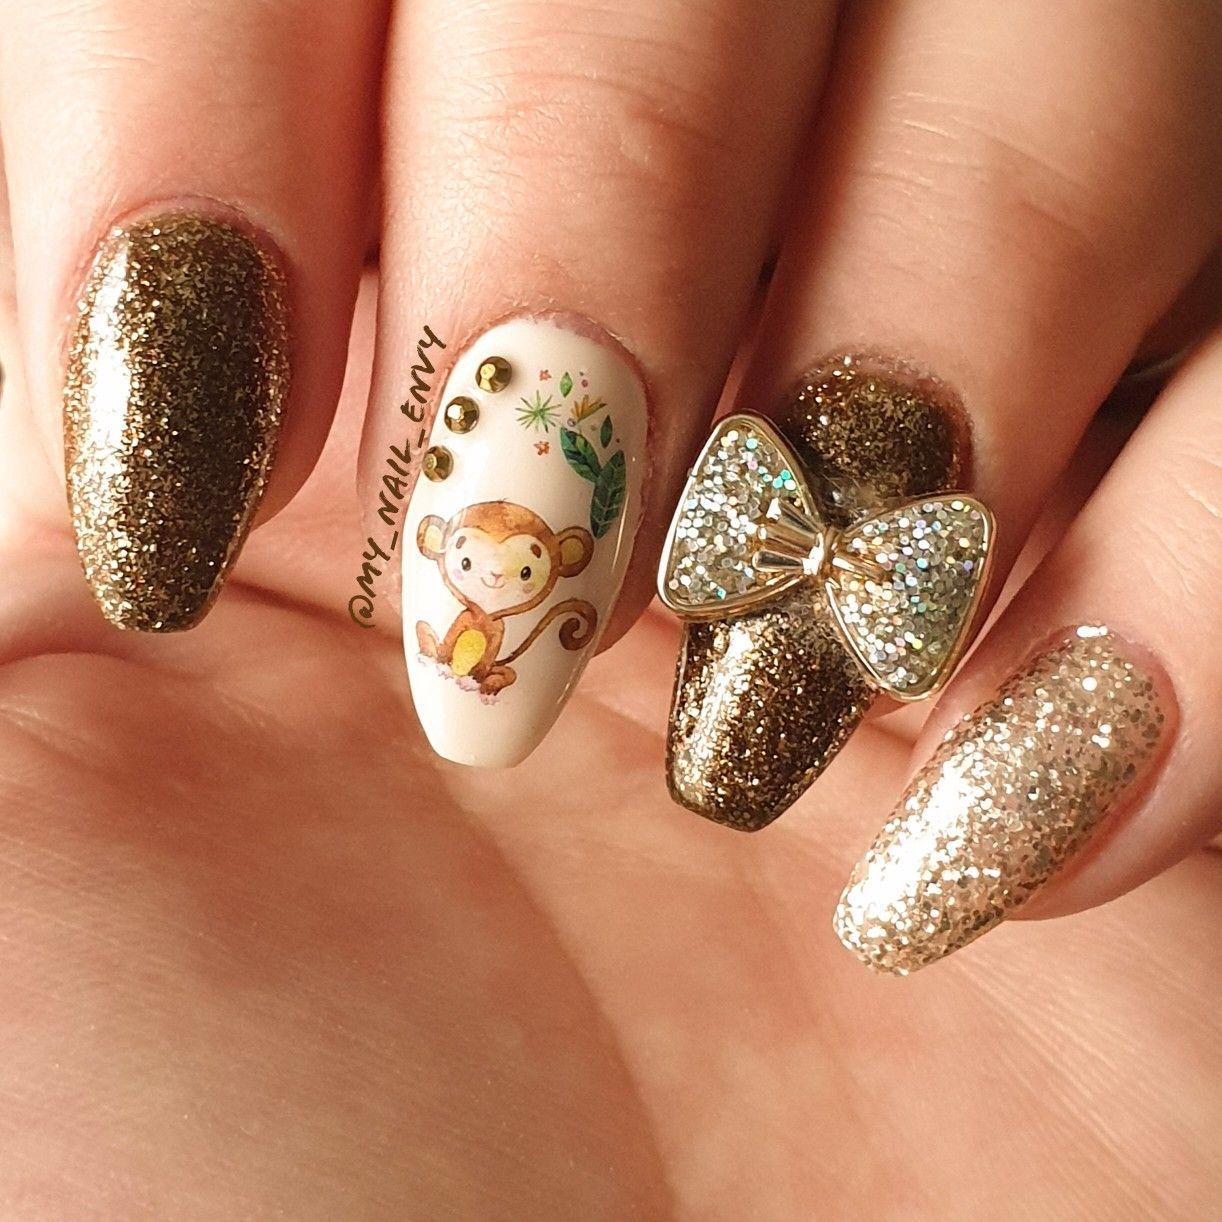 Monkey nails! 🐒  #nailart #shortnails #naturalnails #nails #mani #nailsaddict #nailblogger #monkeynails #fallnails #autumnnails #brownnails #monkey #glitter